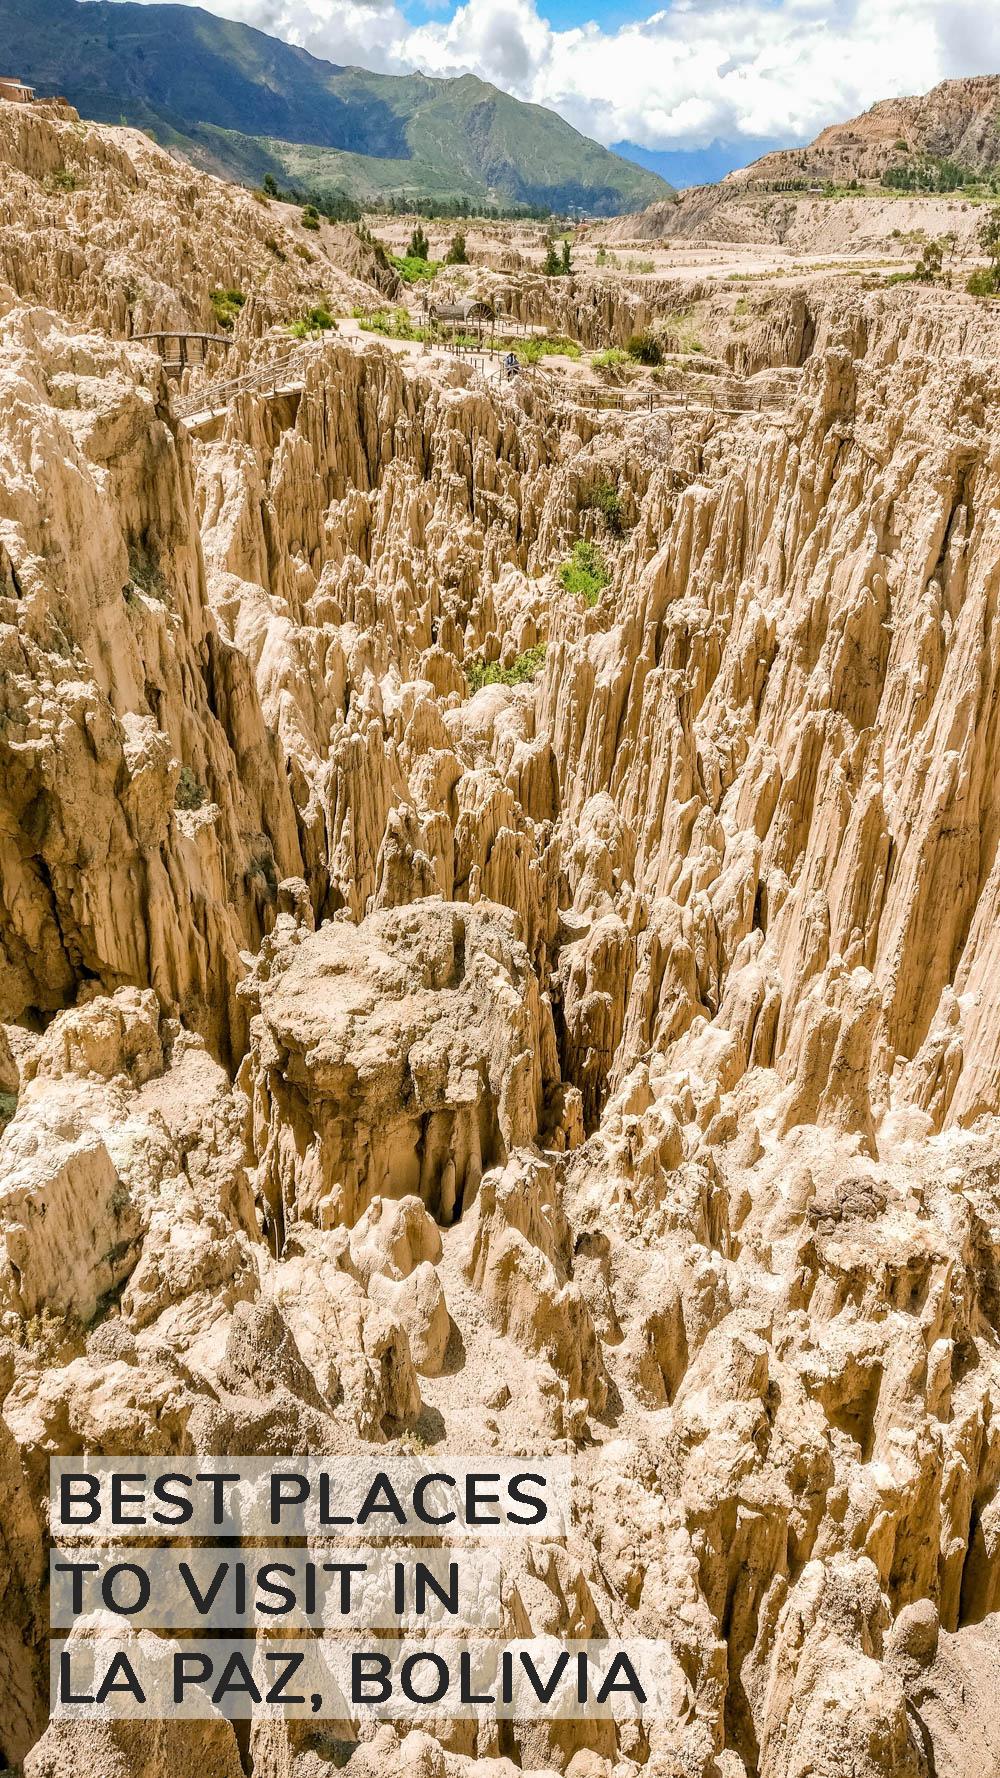 Best places to visit in La Paz, Bolivia | Aliz's Wonderland